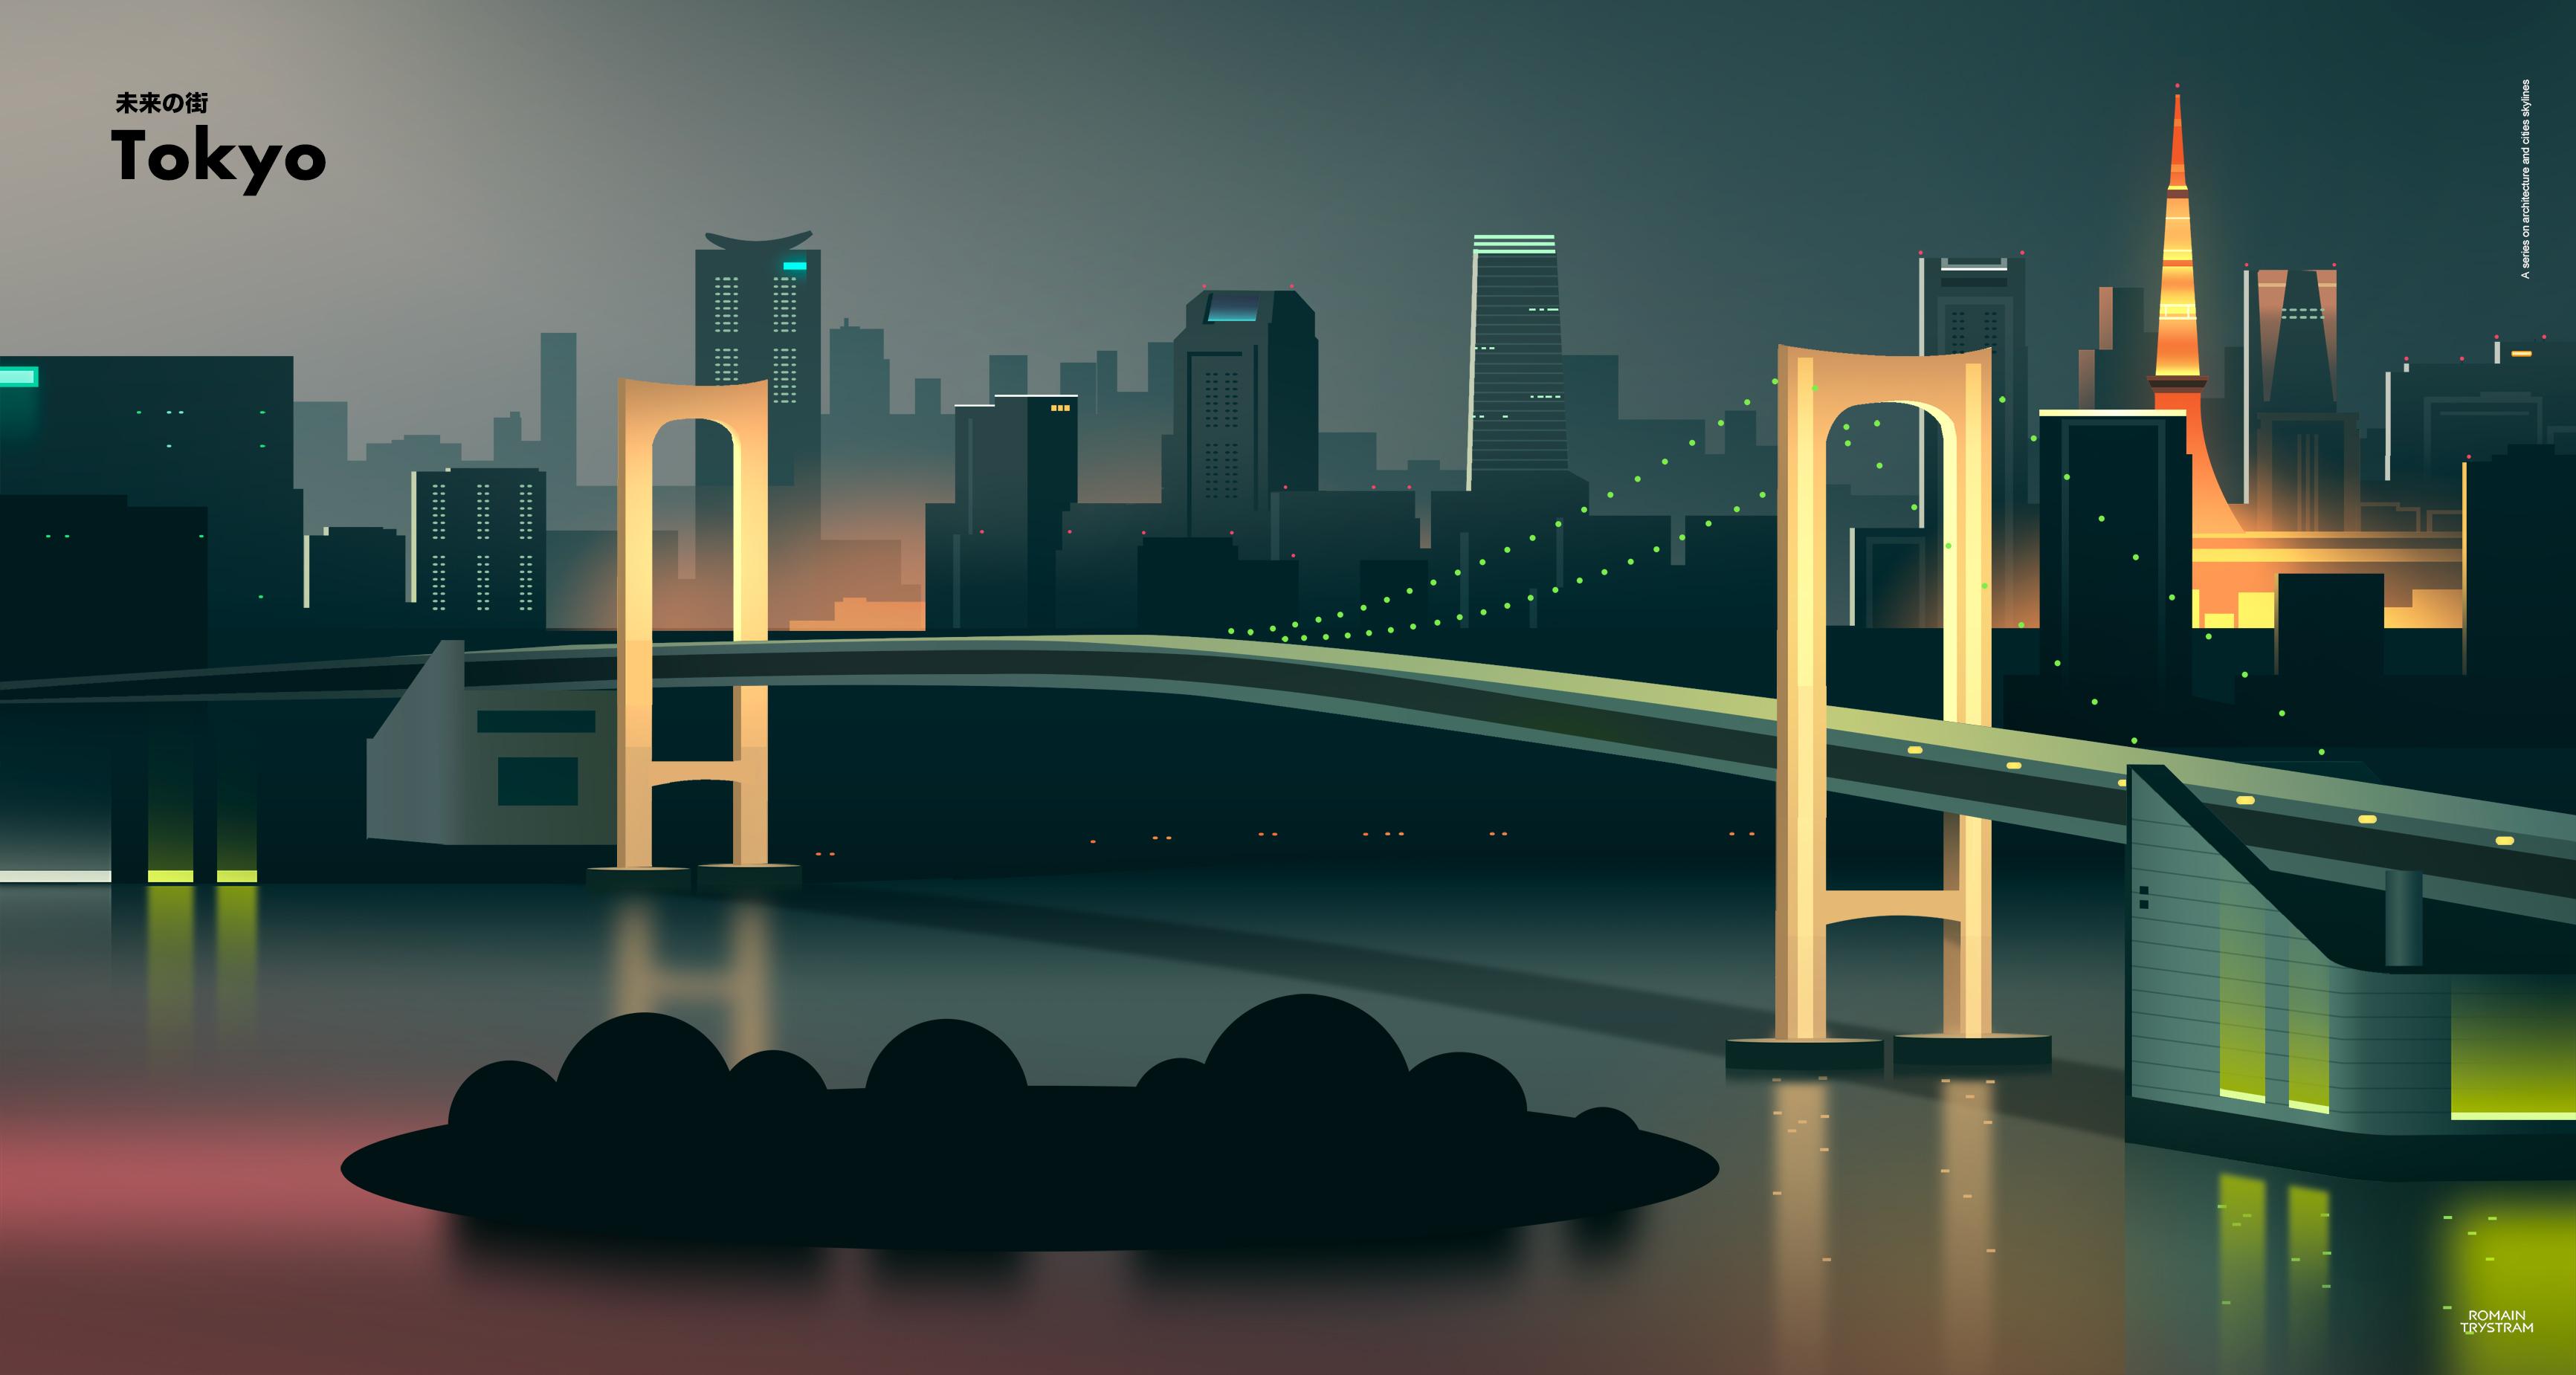 Tokyo City Minimalist 4k, HD Artist, 4k Wallpapers, Images ...